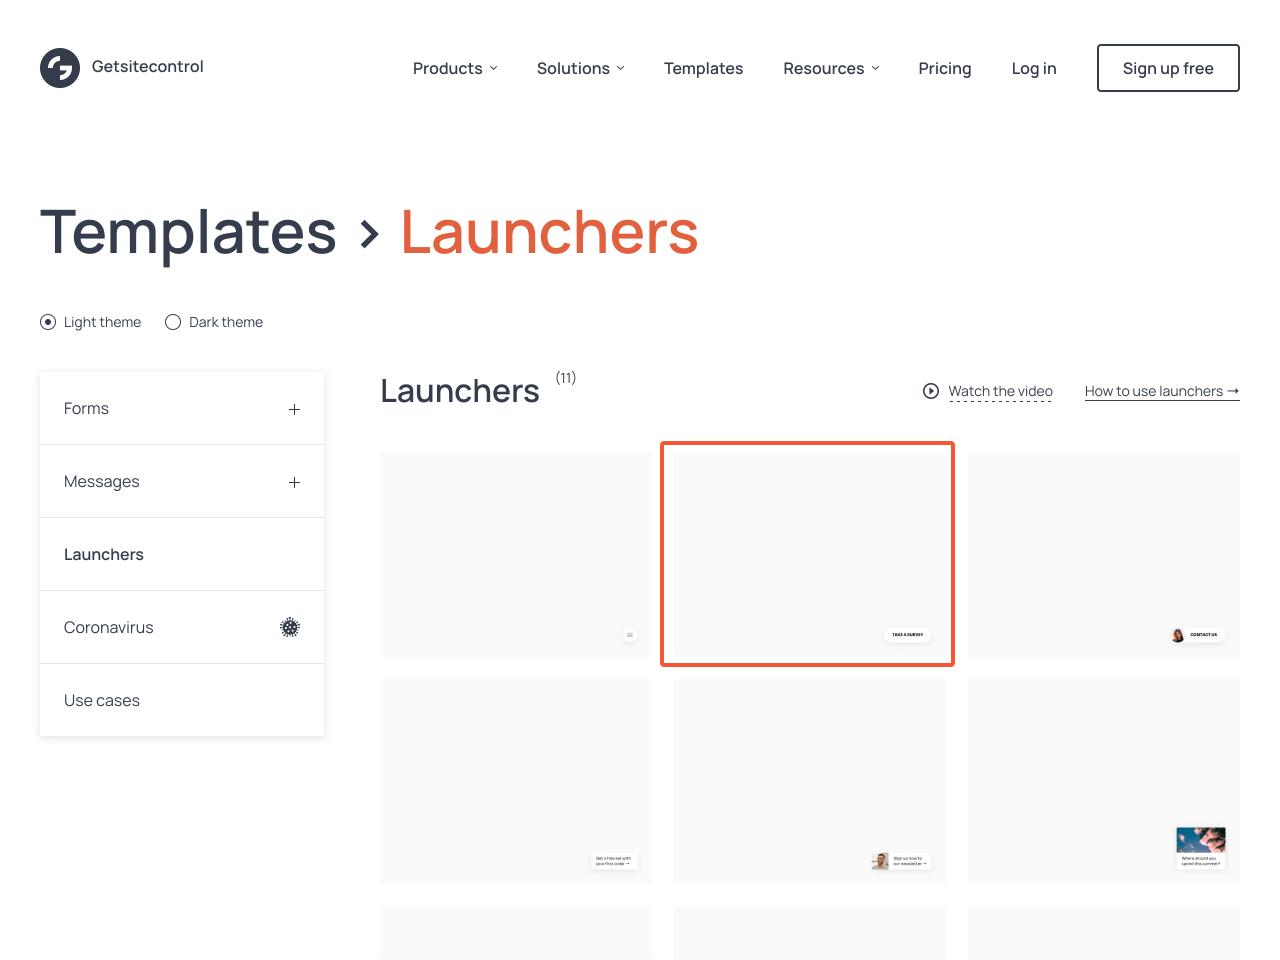 Launchers in Getsitecontrol templates gallery